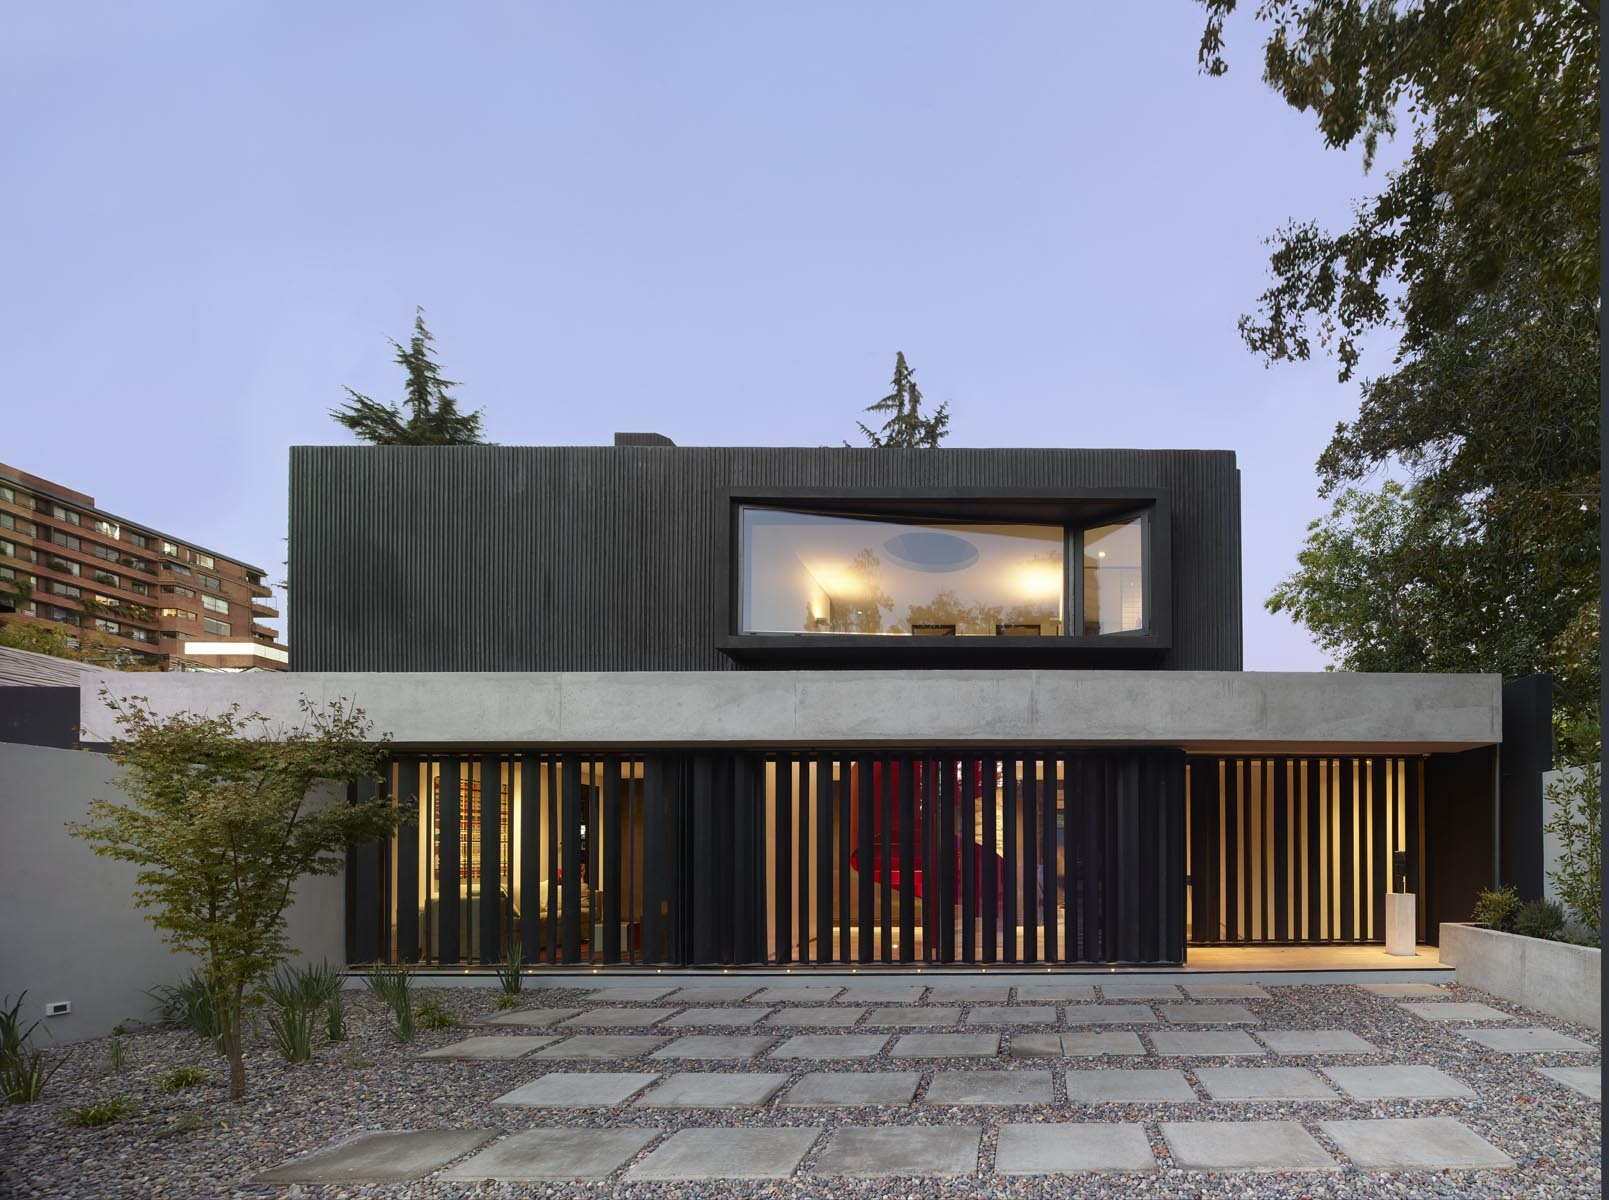 Galer a de casa m laga prietoschaffer arquitectos 10 - Arquitectos interioristas malaga ...